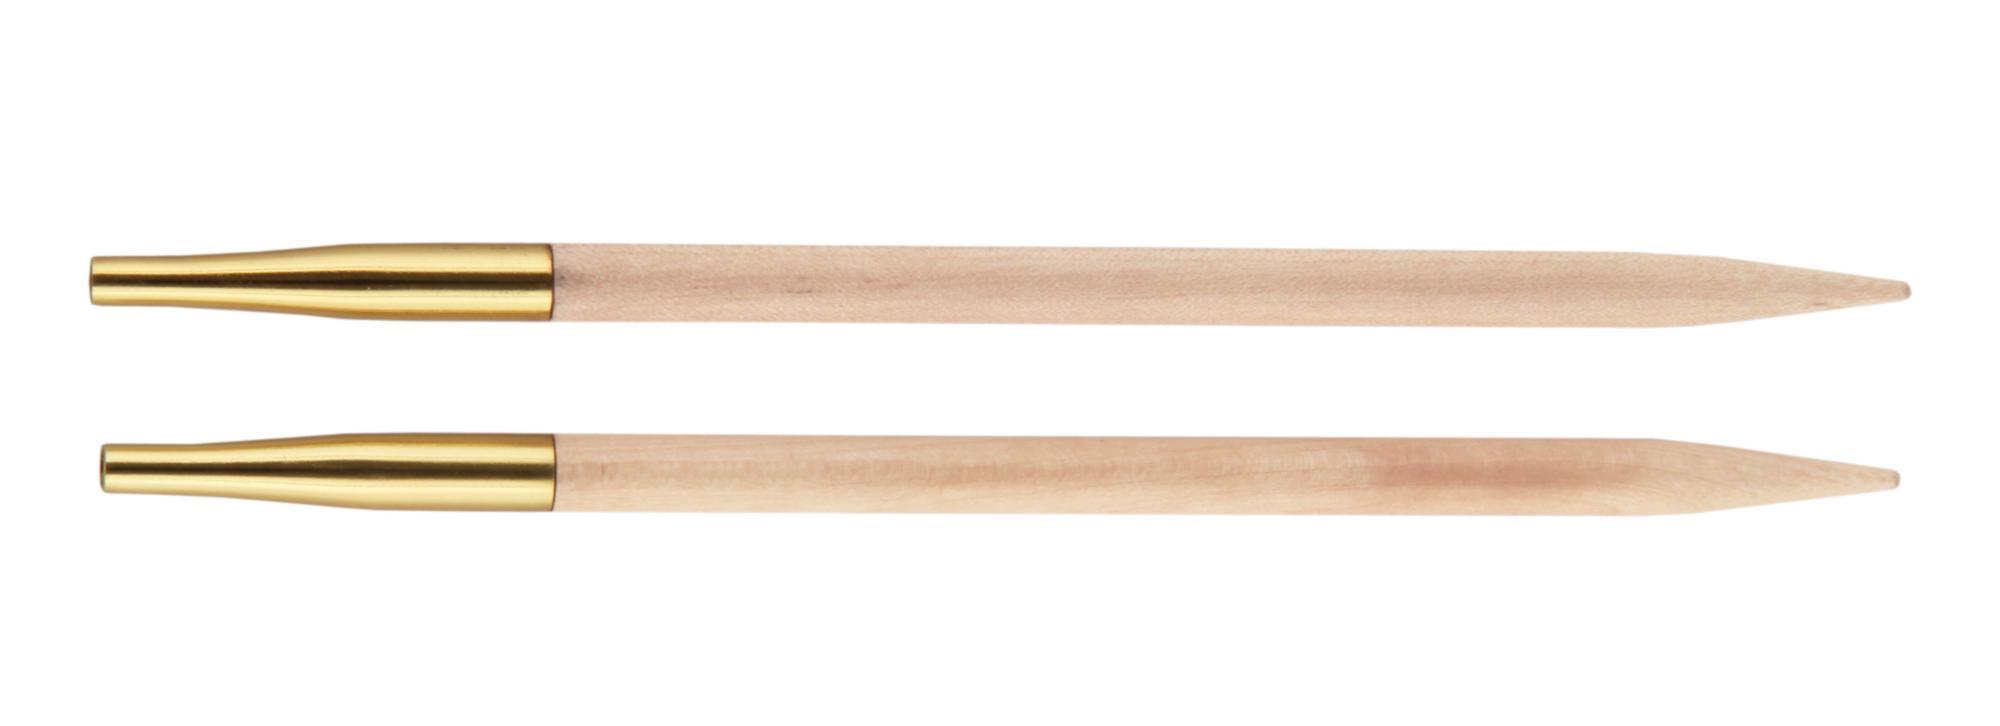 Спицы съемные Basix Birch Wood KnitPro, 35634, 3.75 мм